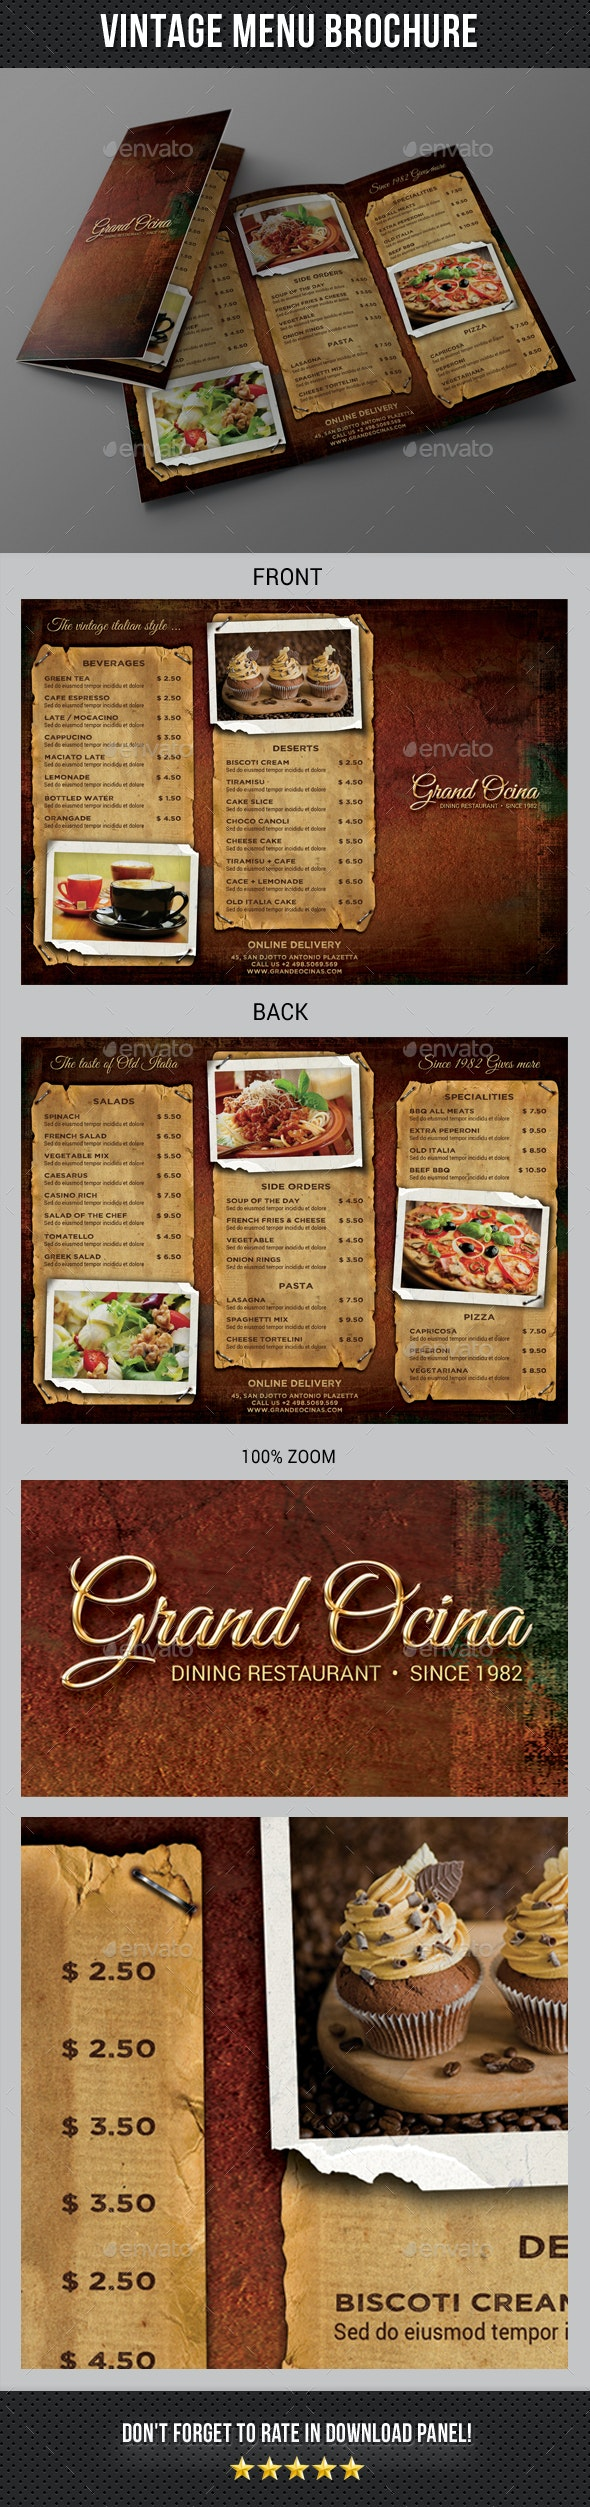 Vintage Menu 3-Fold Brochure - Food Menus Print Templates